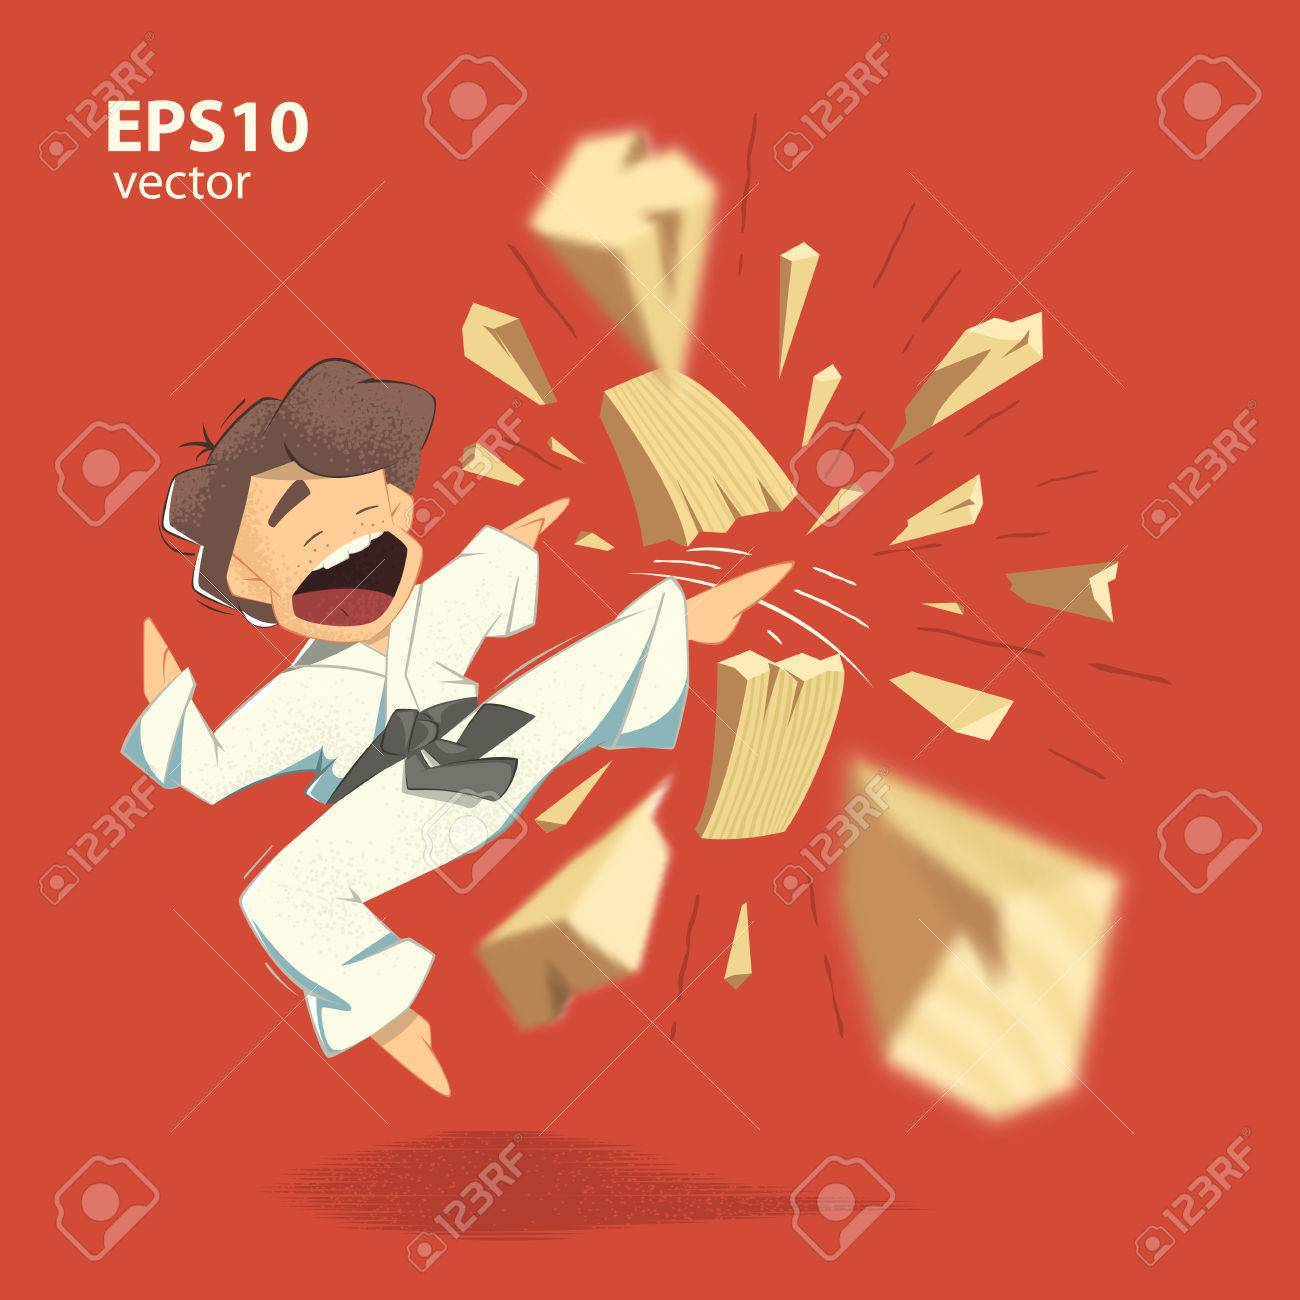 Cartoon character karate kid breaking wooden board illustration - 50570865